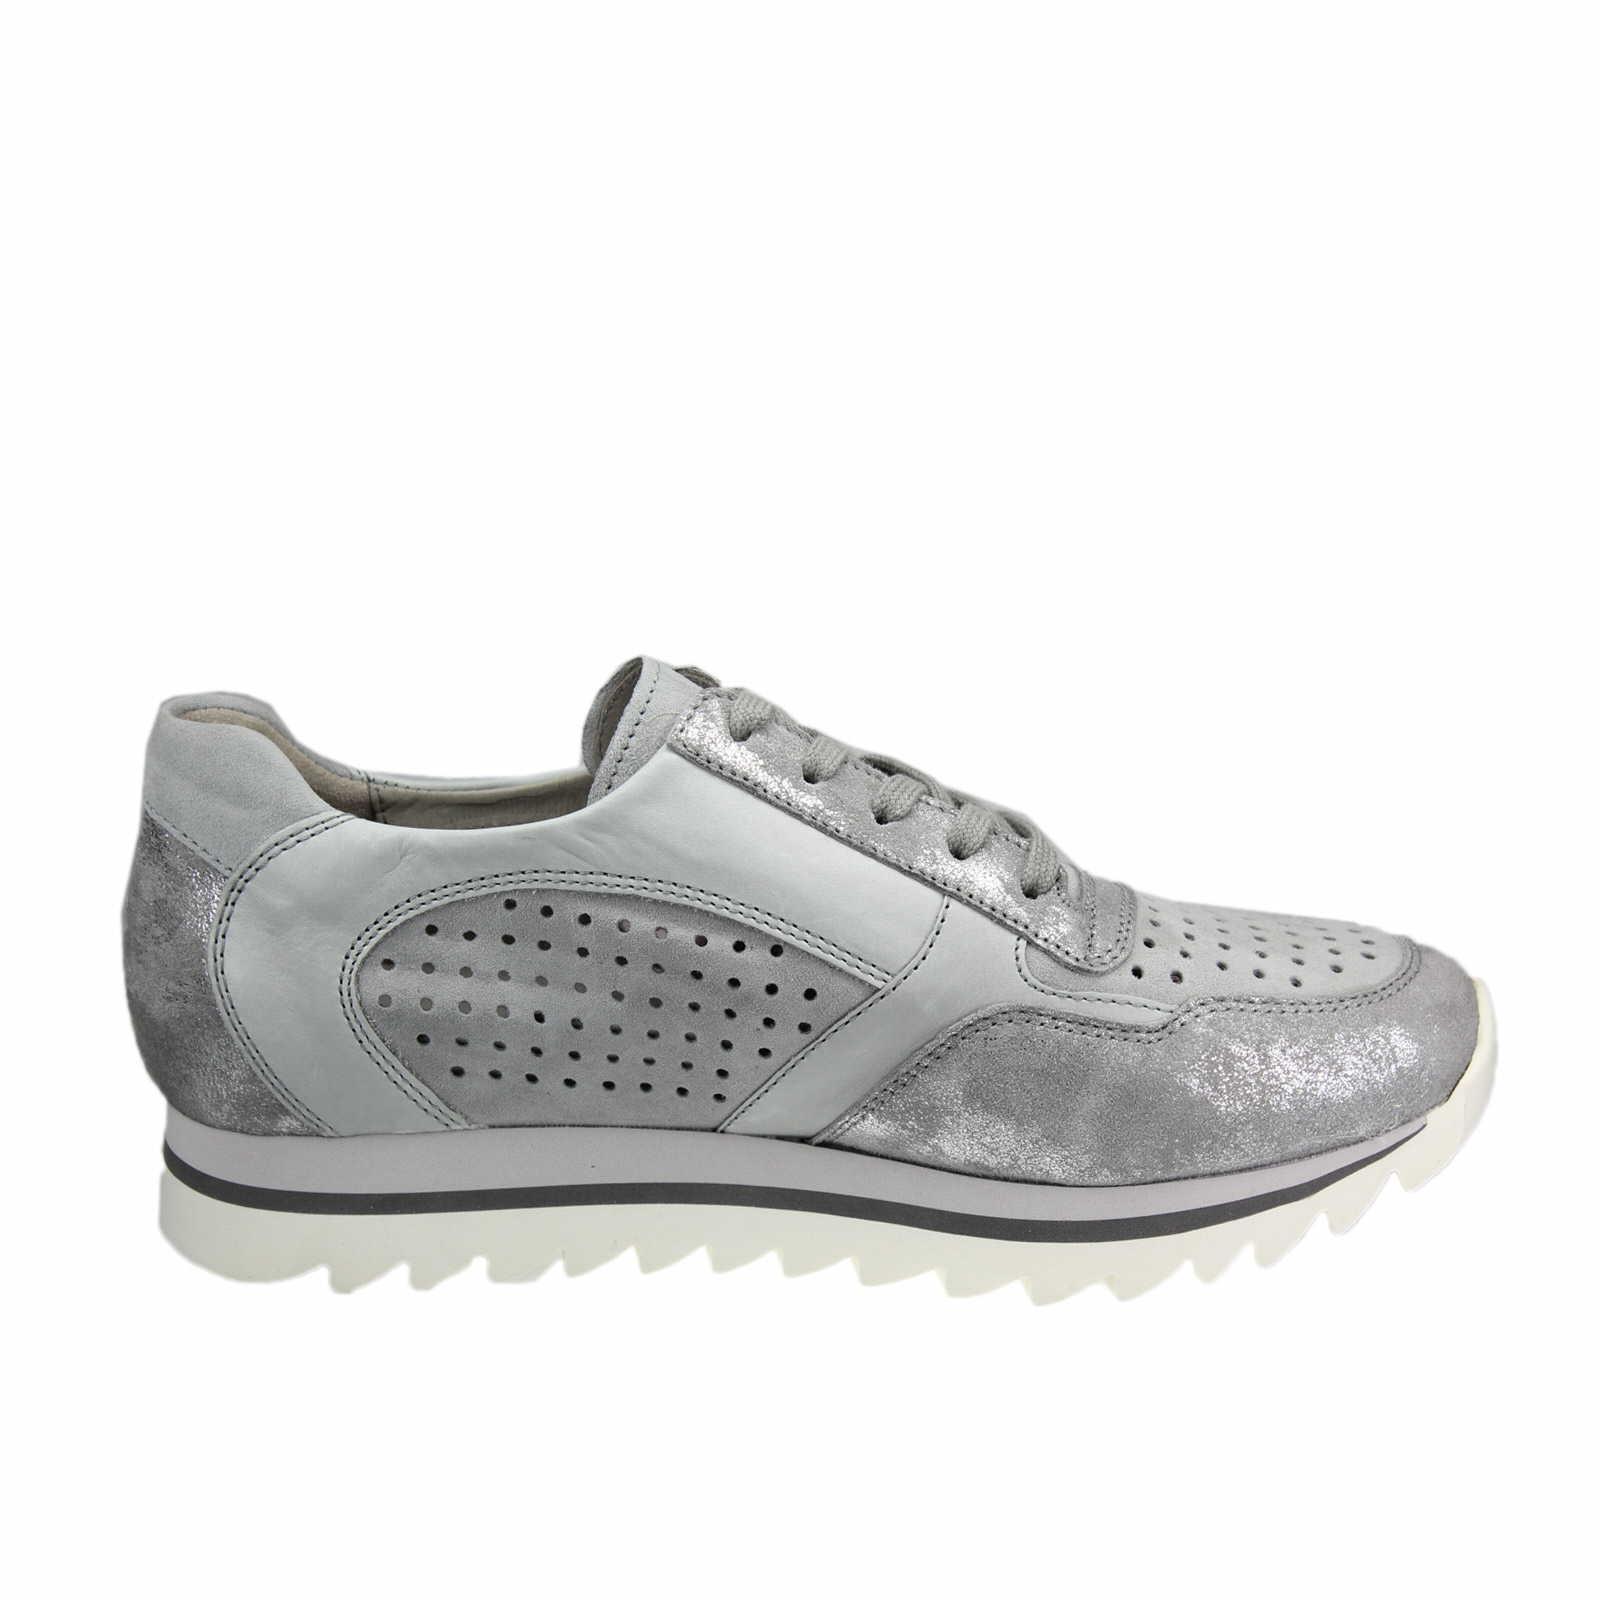 gabor damen sneaker grau silber f r damen in grau. Black Bedroom Furniture Sets. Home Design Ideas